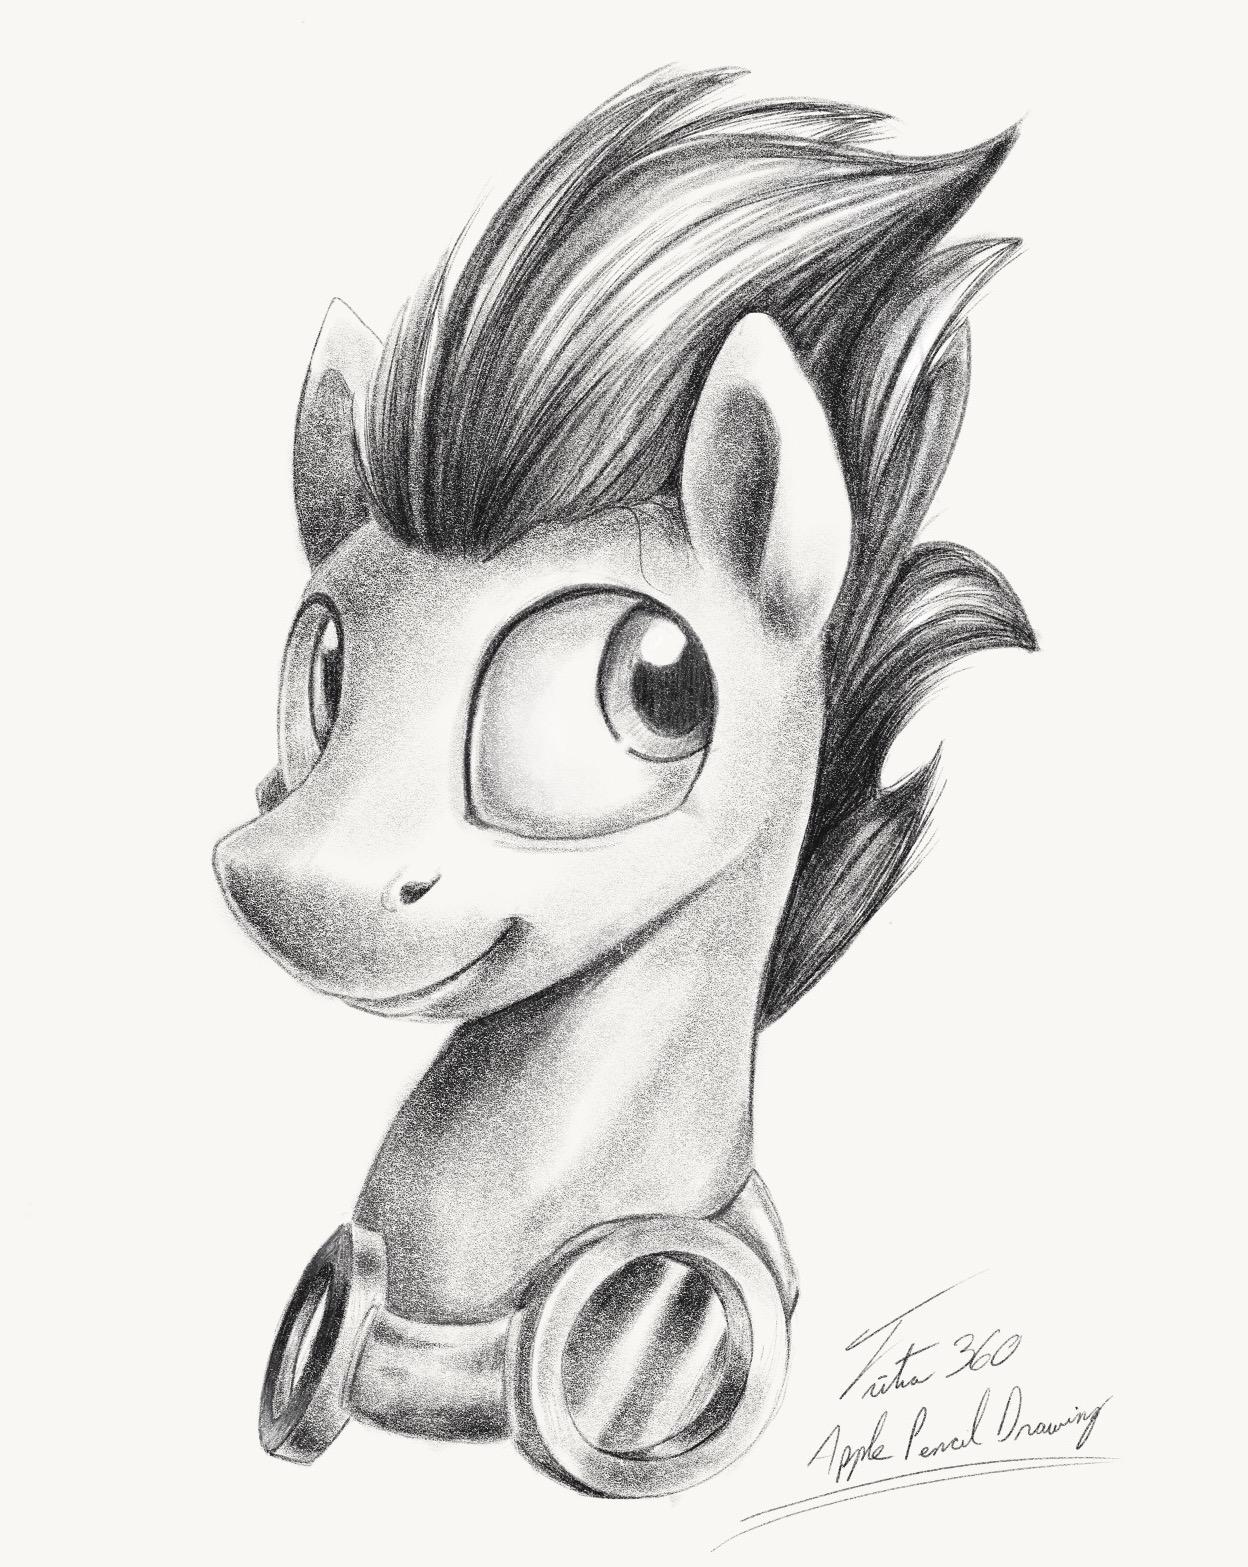 Soarin - Apple Pencil Drawing